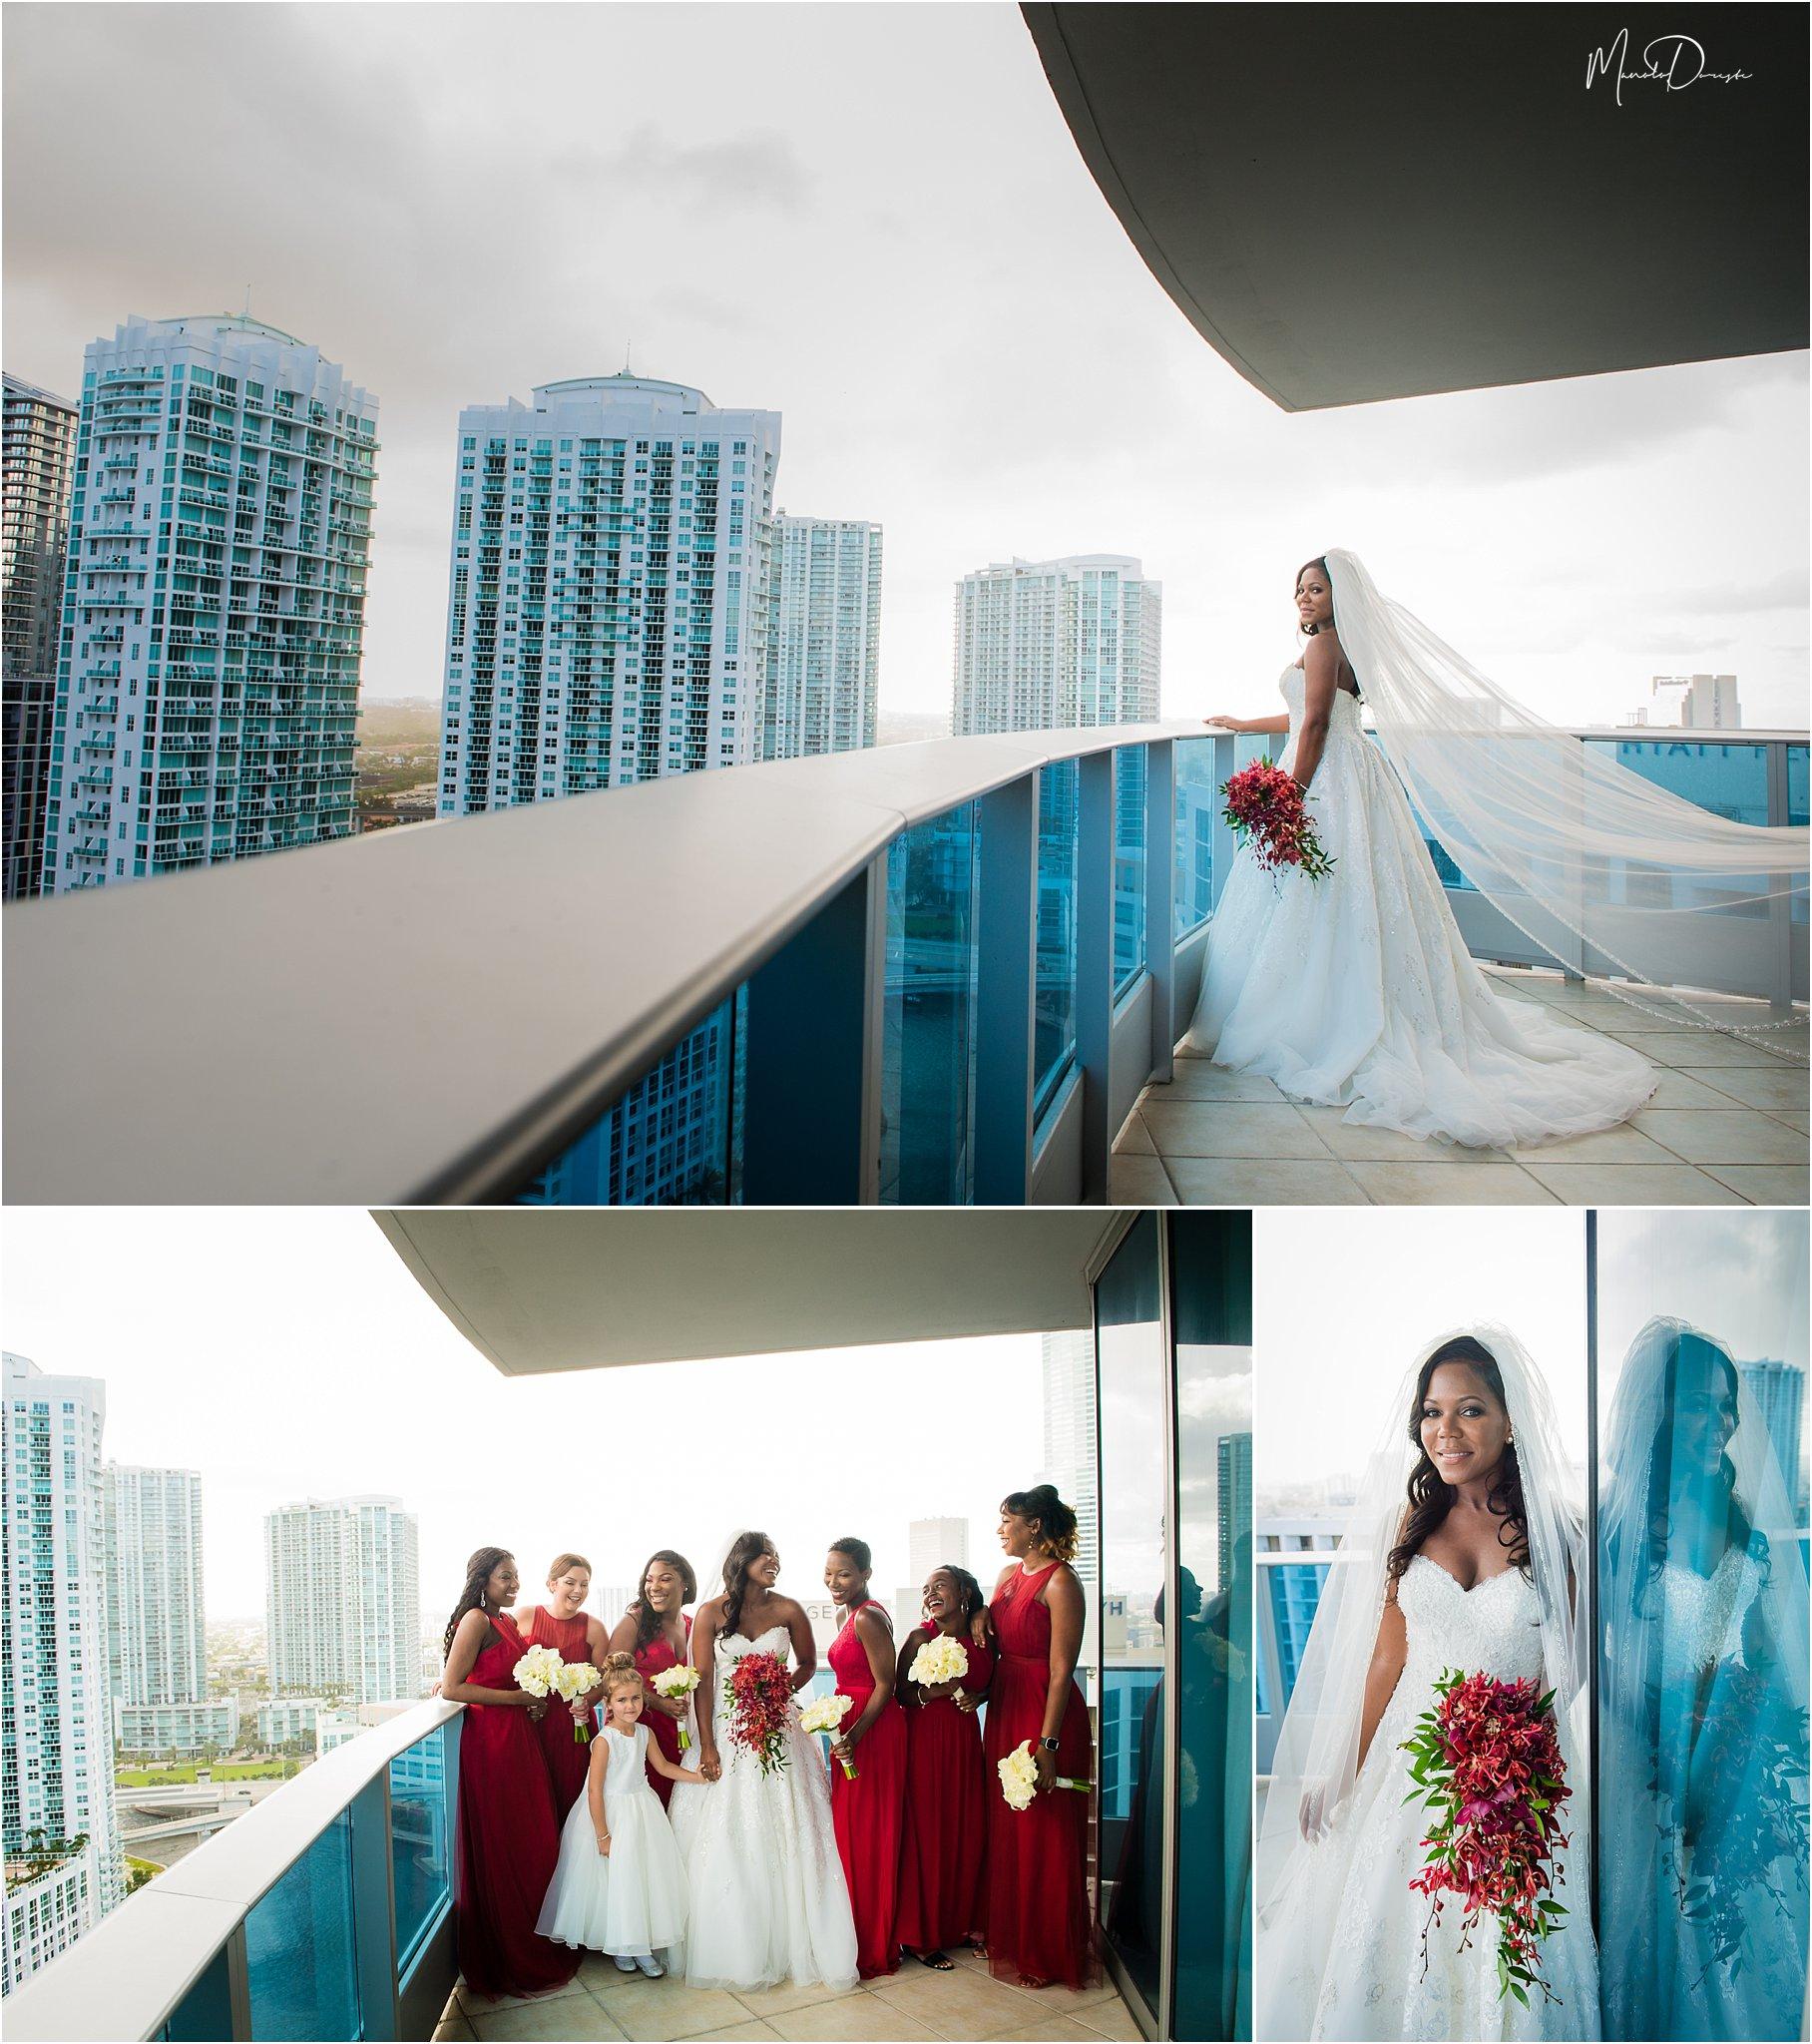 0117_ManoloDoreste_InFocusStudios_Wedding_Family_Photography_Miami_MiamiPhotographer.jpg